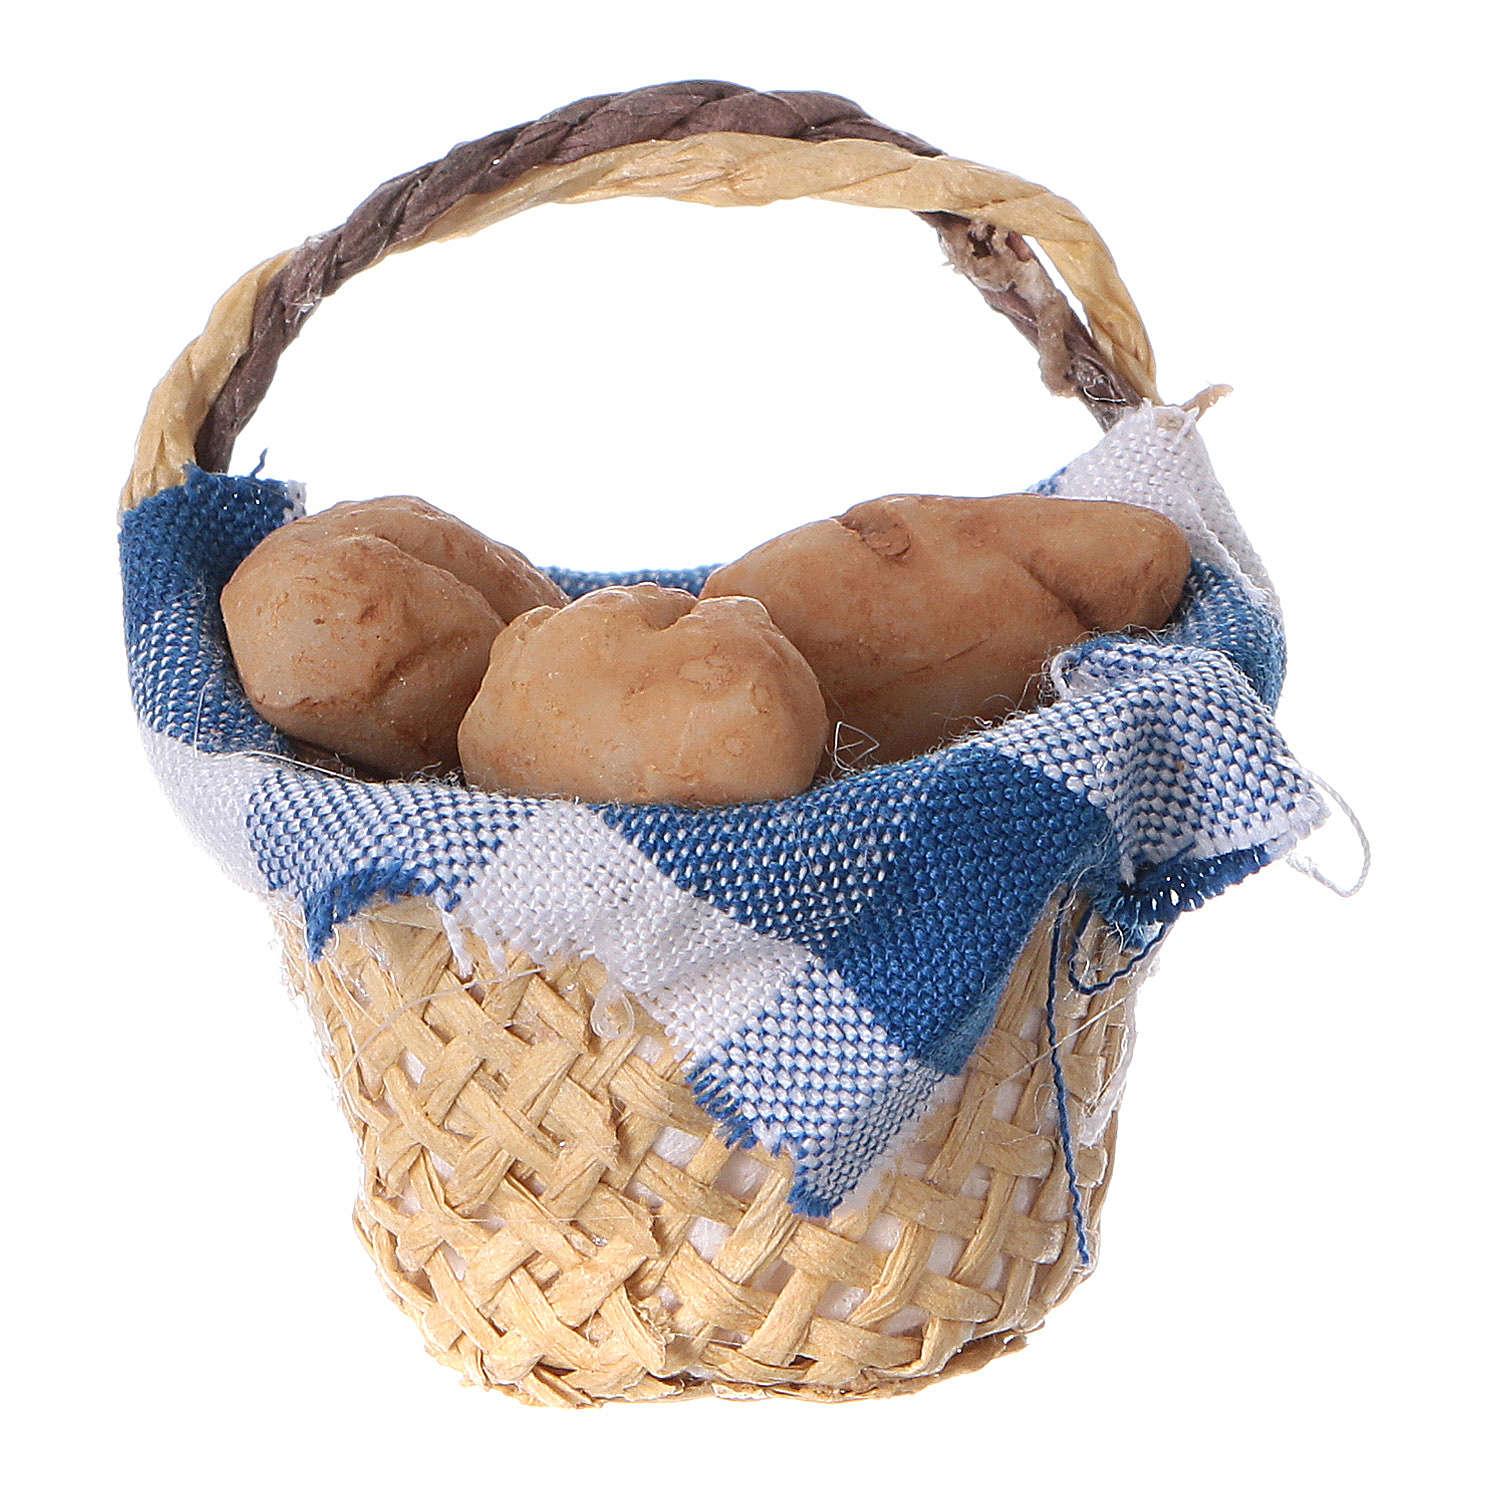 Bread basket for DIY nativity, real h 4 cm 4